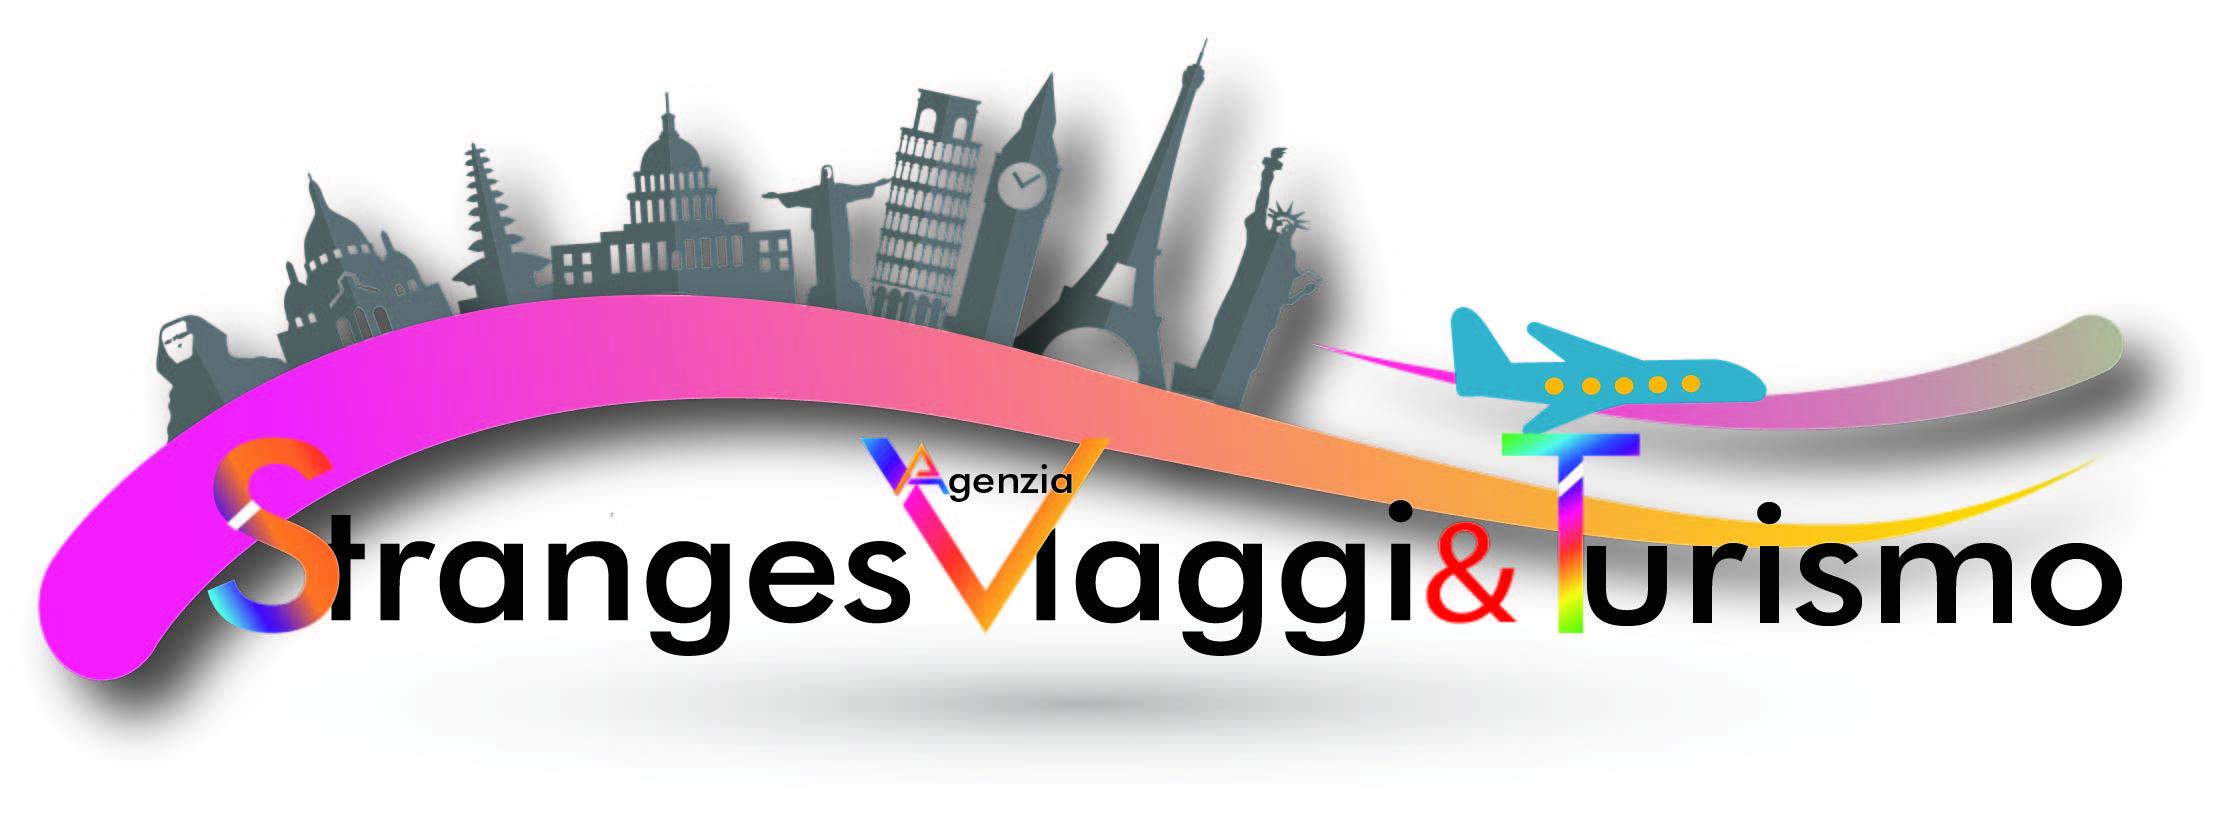 Agenzia di viaggi stranges viaggi e turismo for Arredamento agenzia viaggi